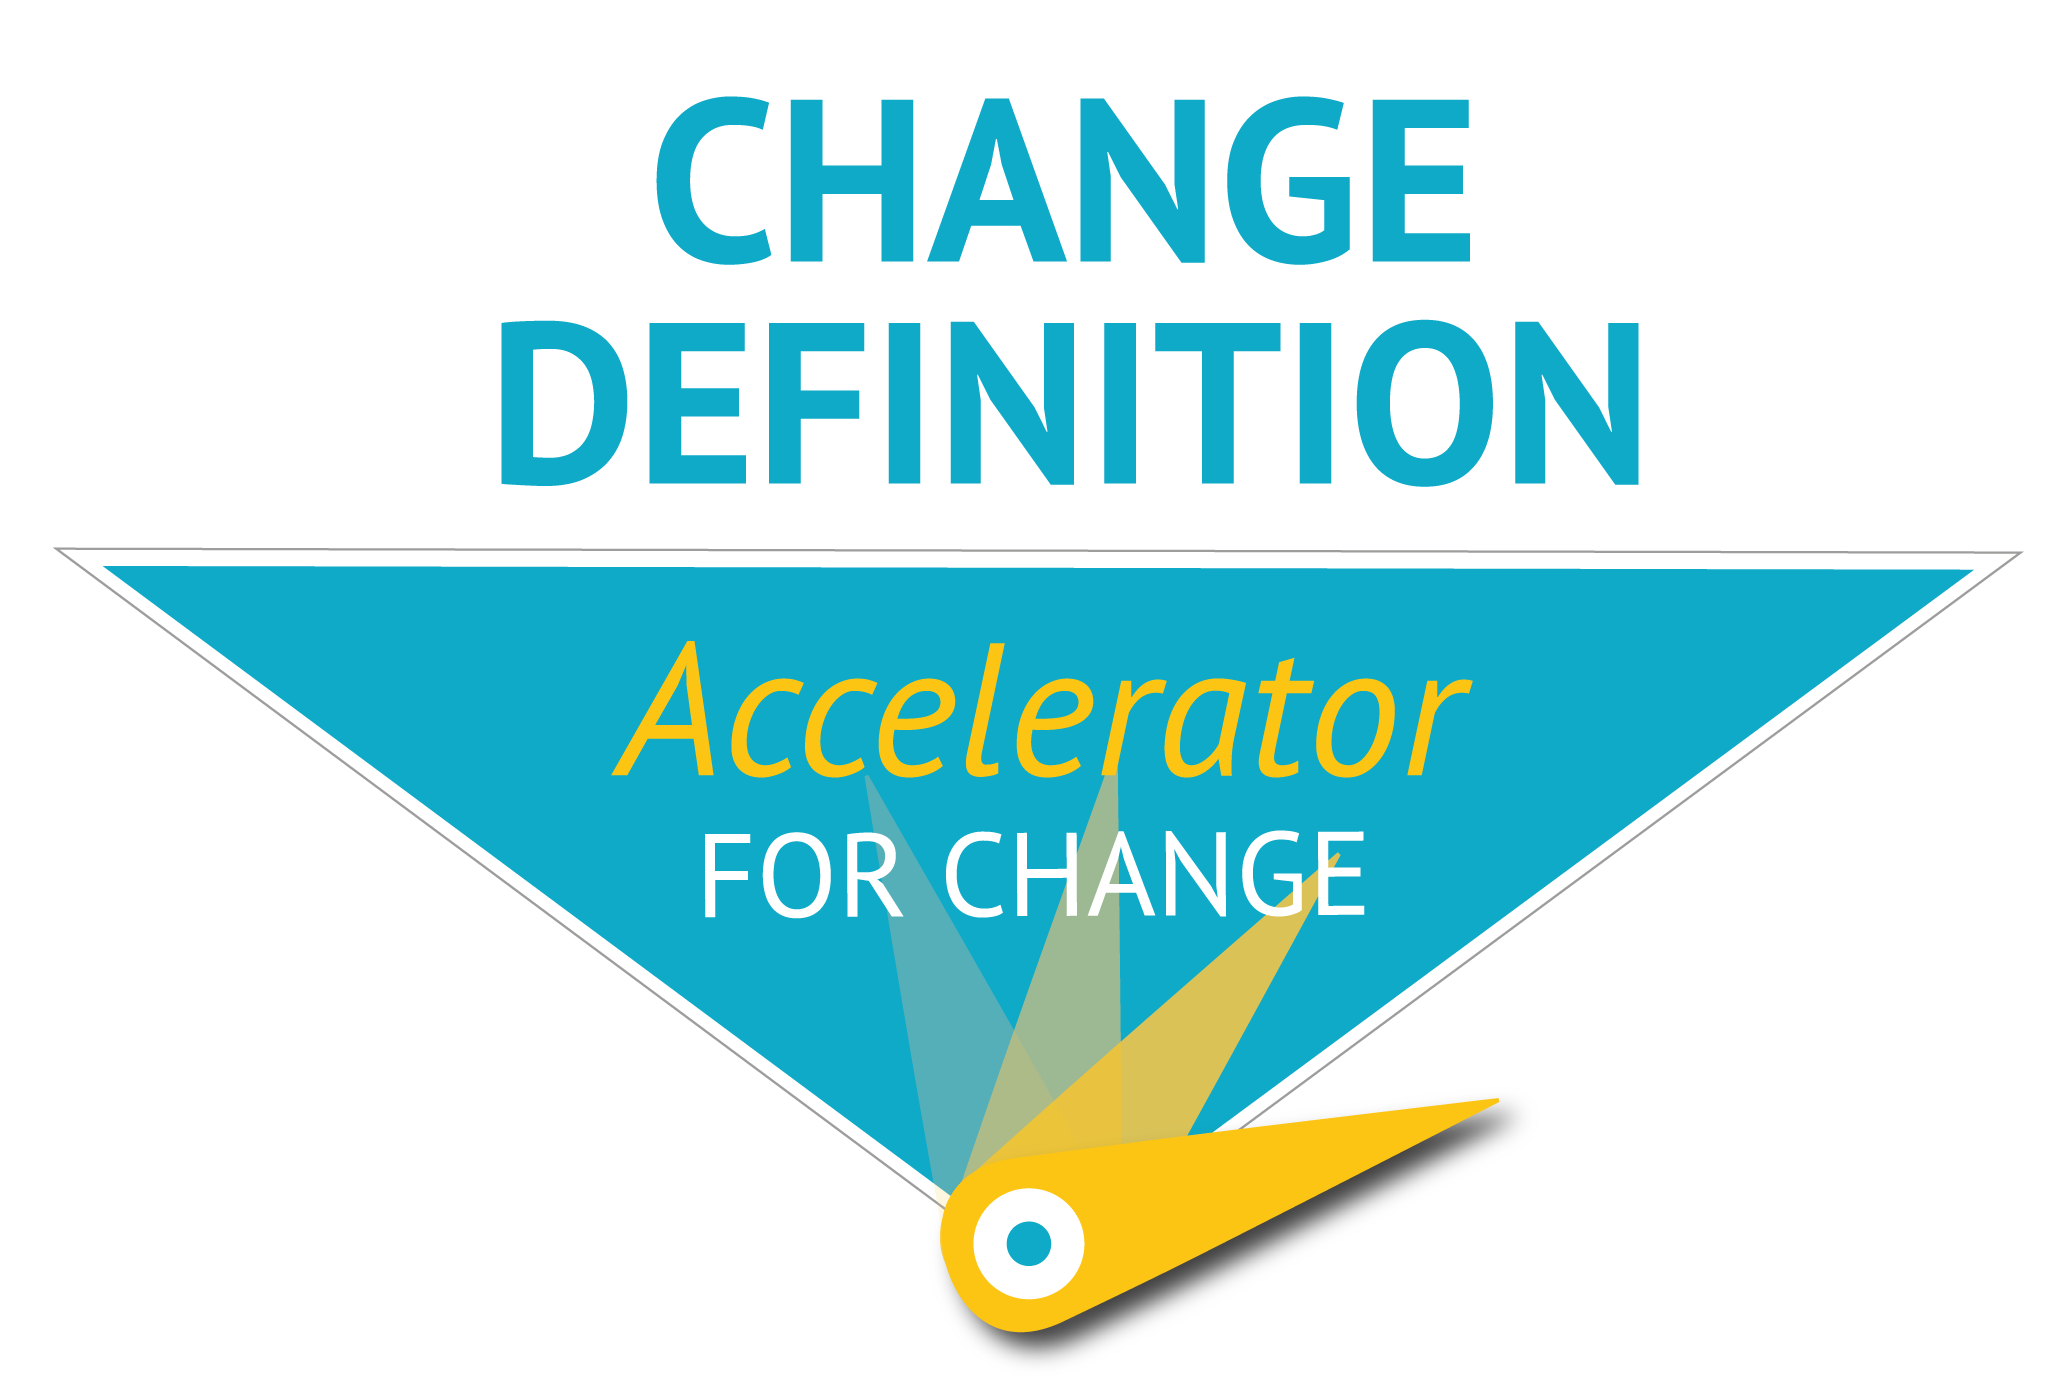 Change-Definition-Accelerator_logo